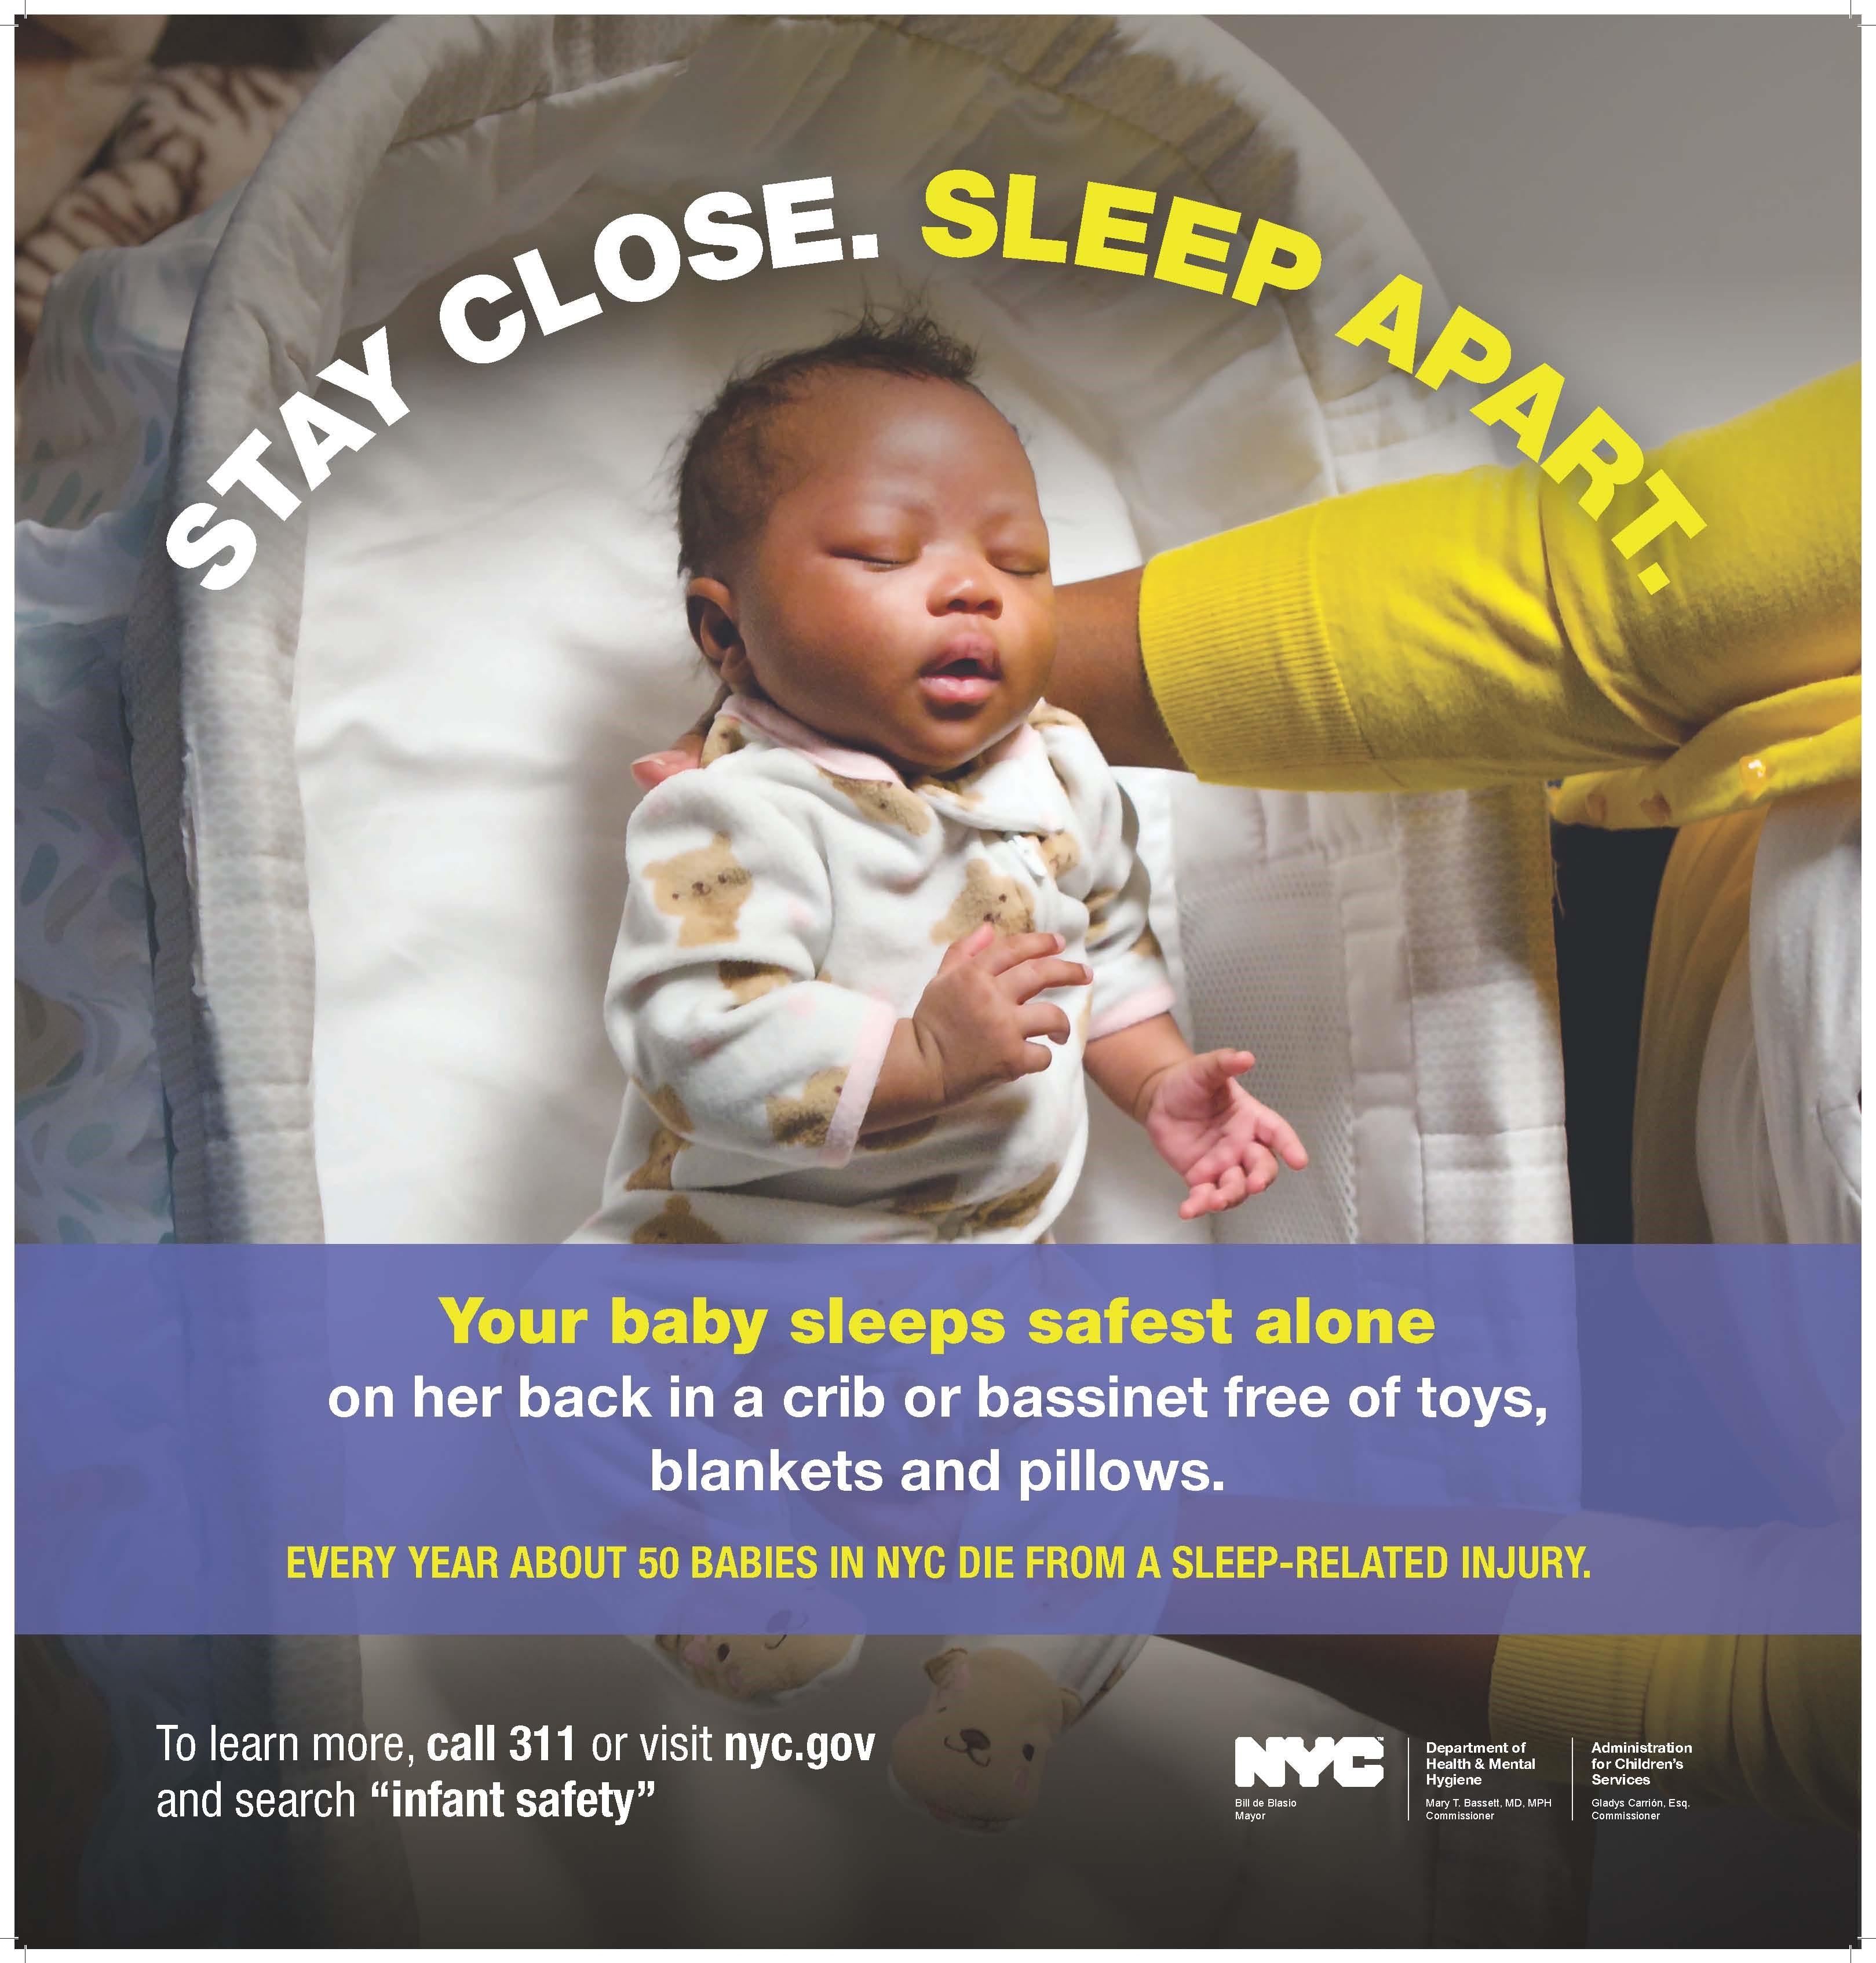 New York Ny Nyc Announces Safe Sleep Campaign To Reduce